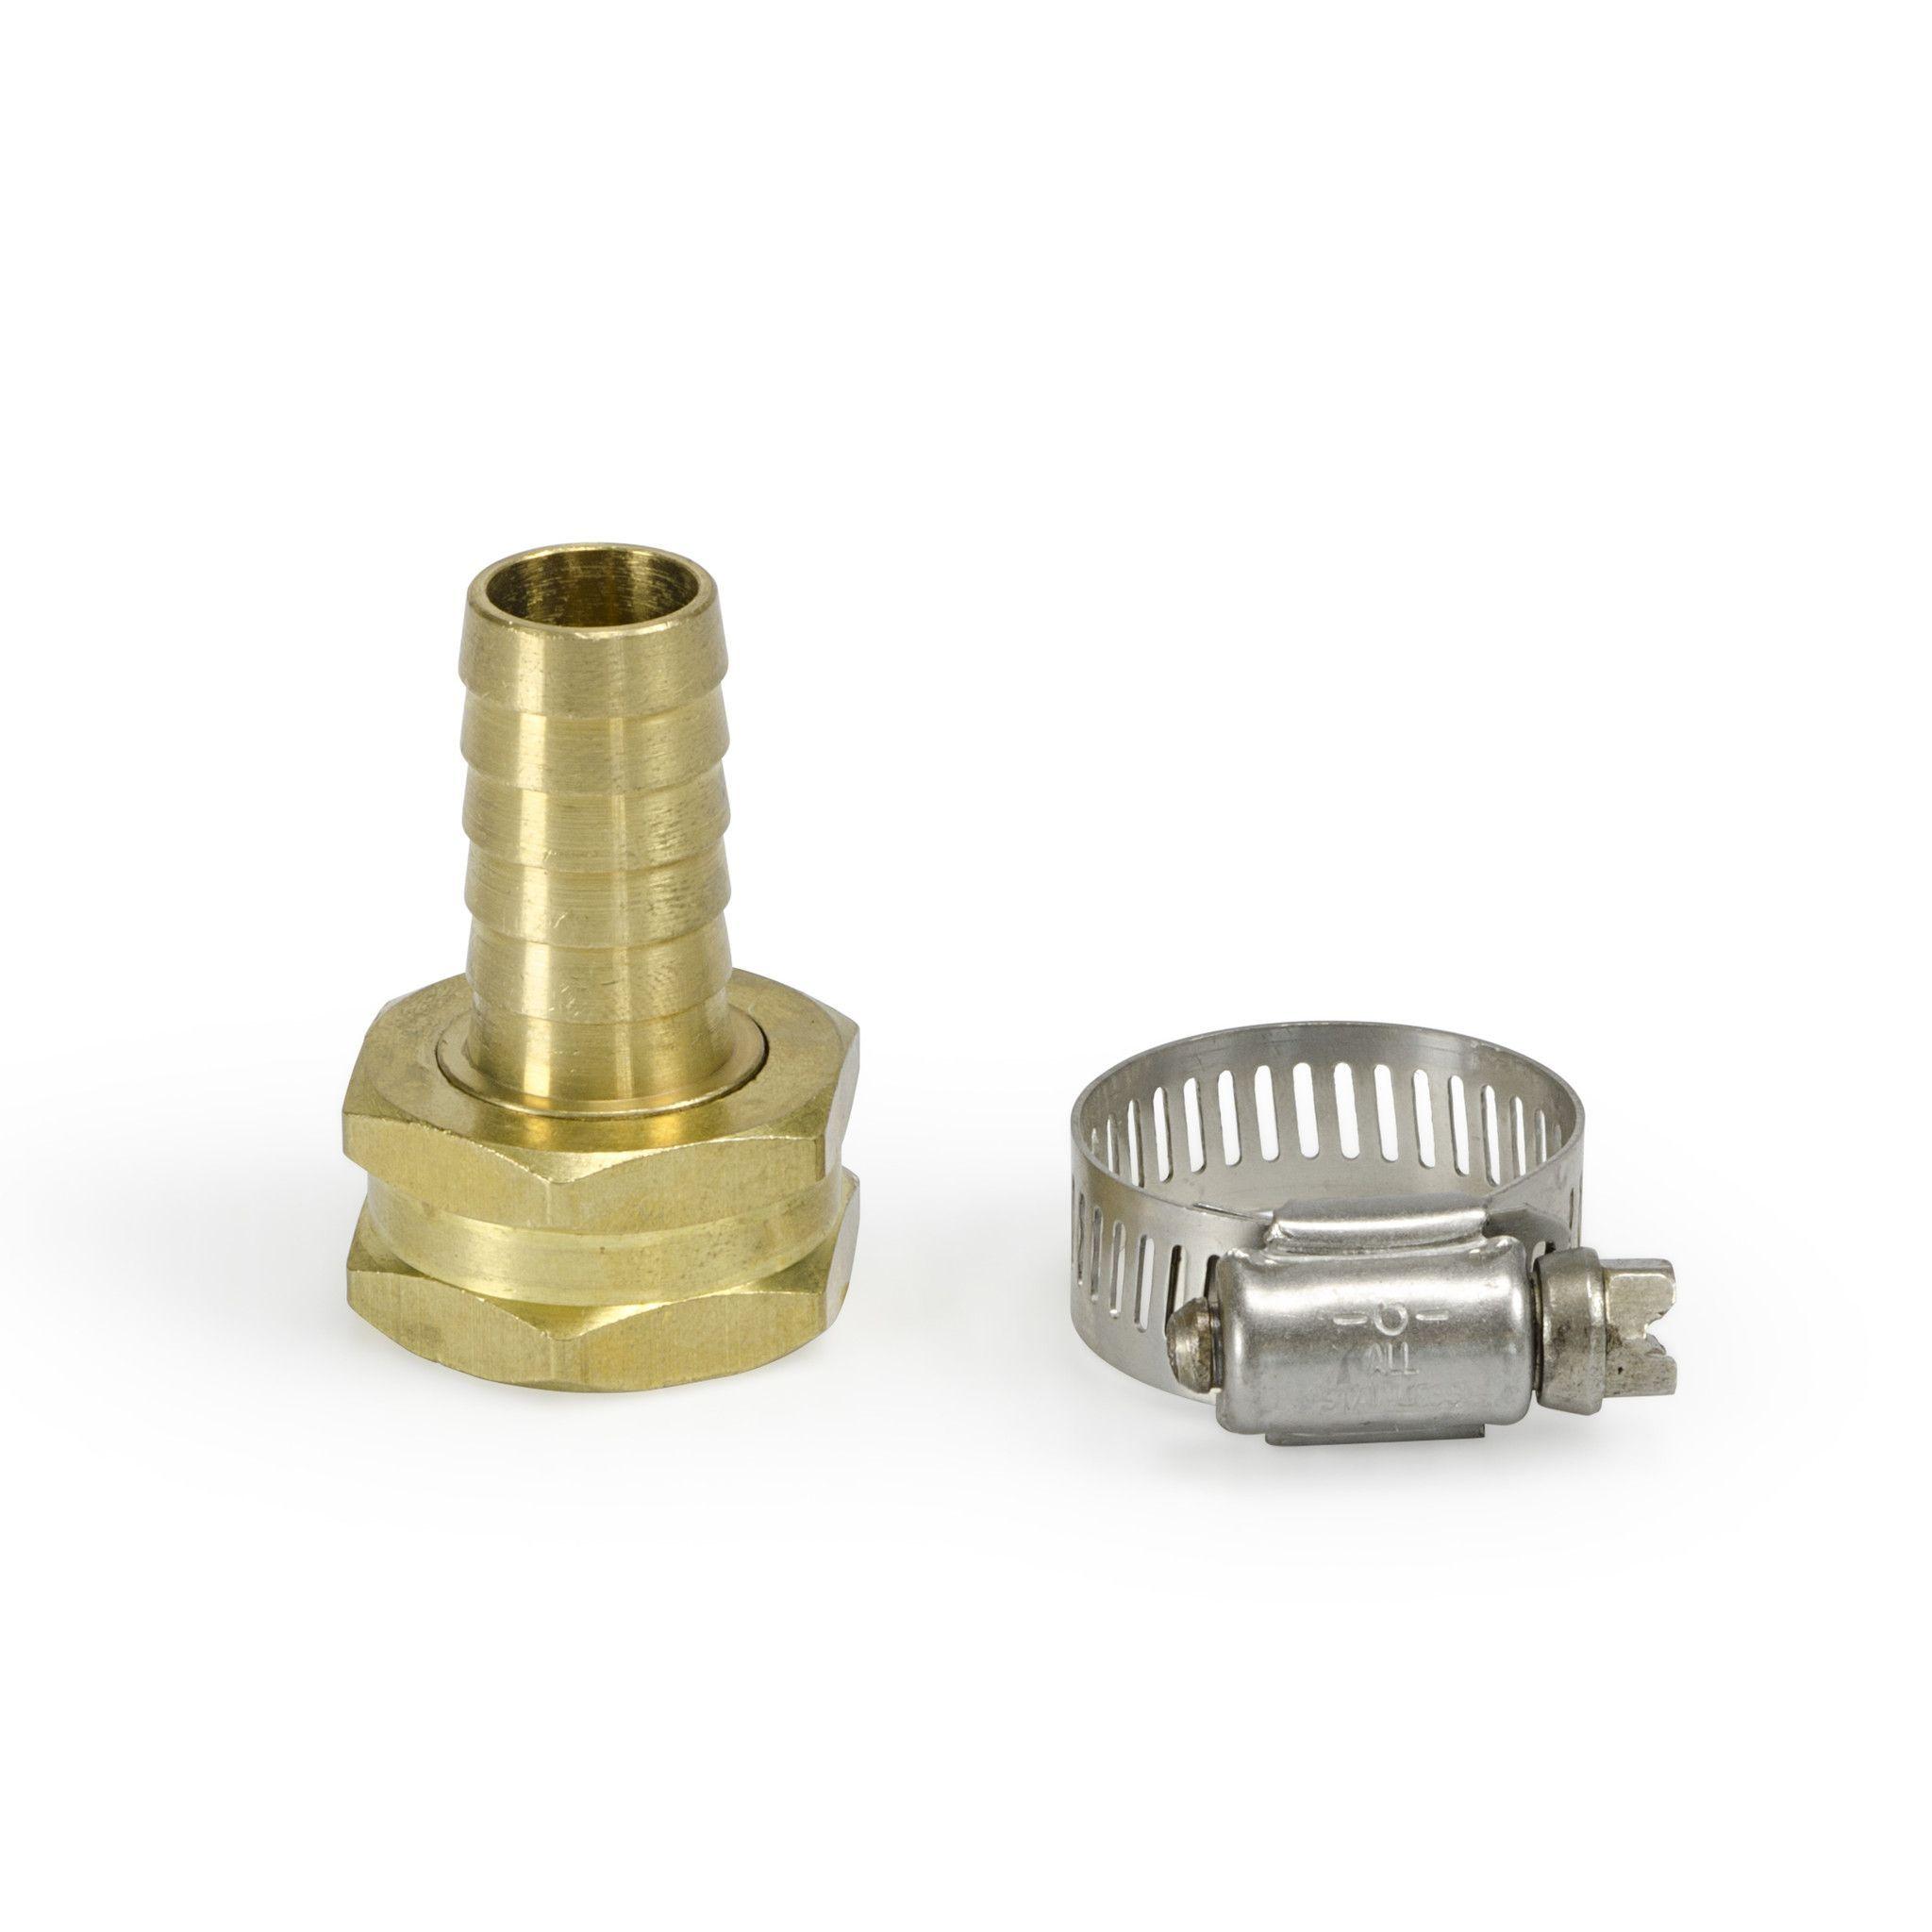 Garden Hose Adapter Assembly Fill valve, Garden hose, Hose